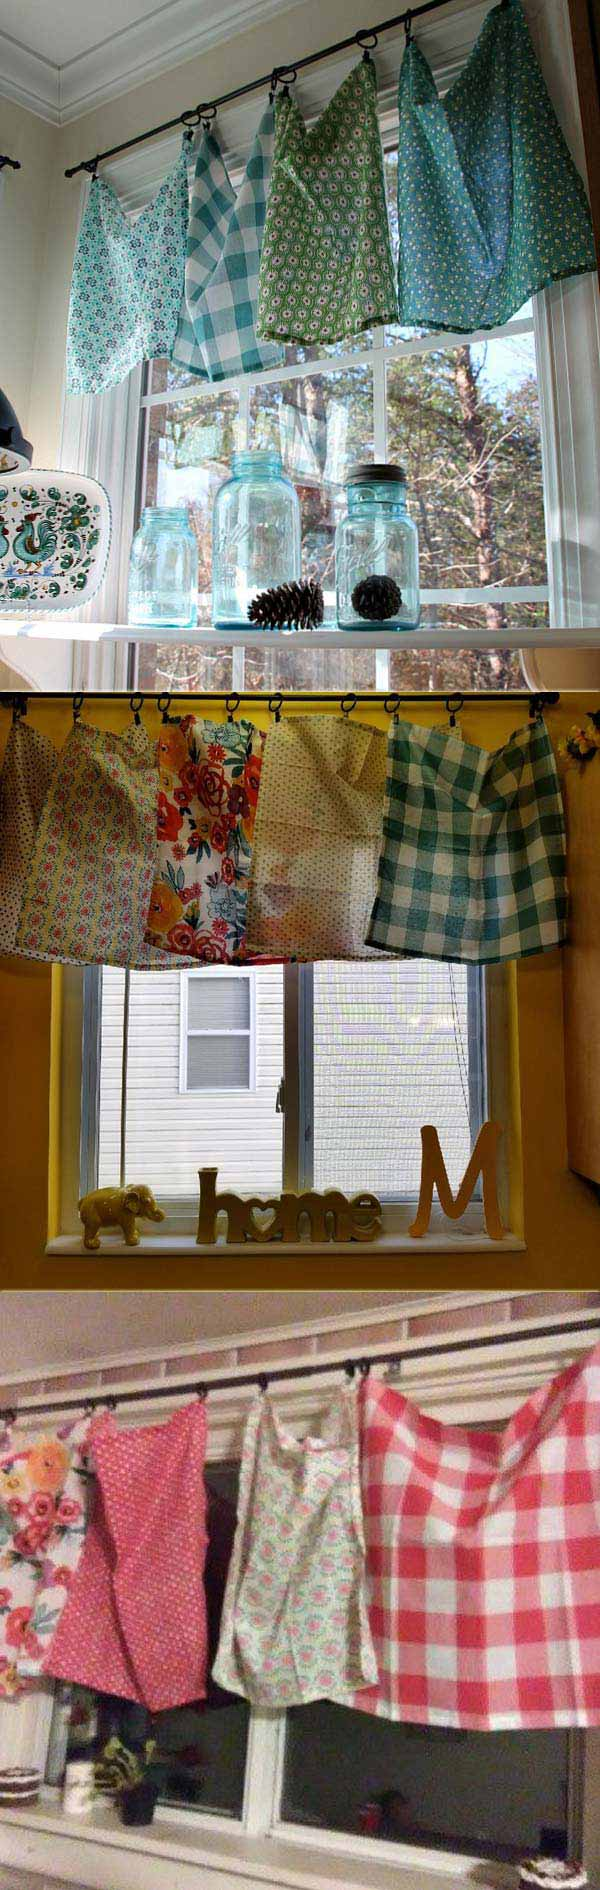 cheap and easy diy window valance ideas